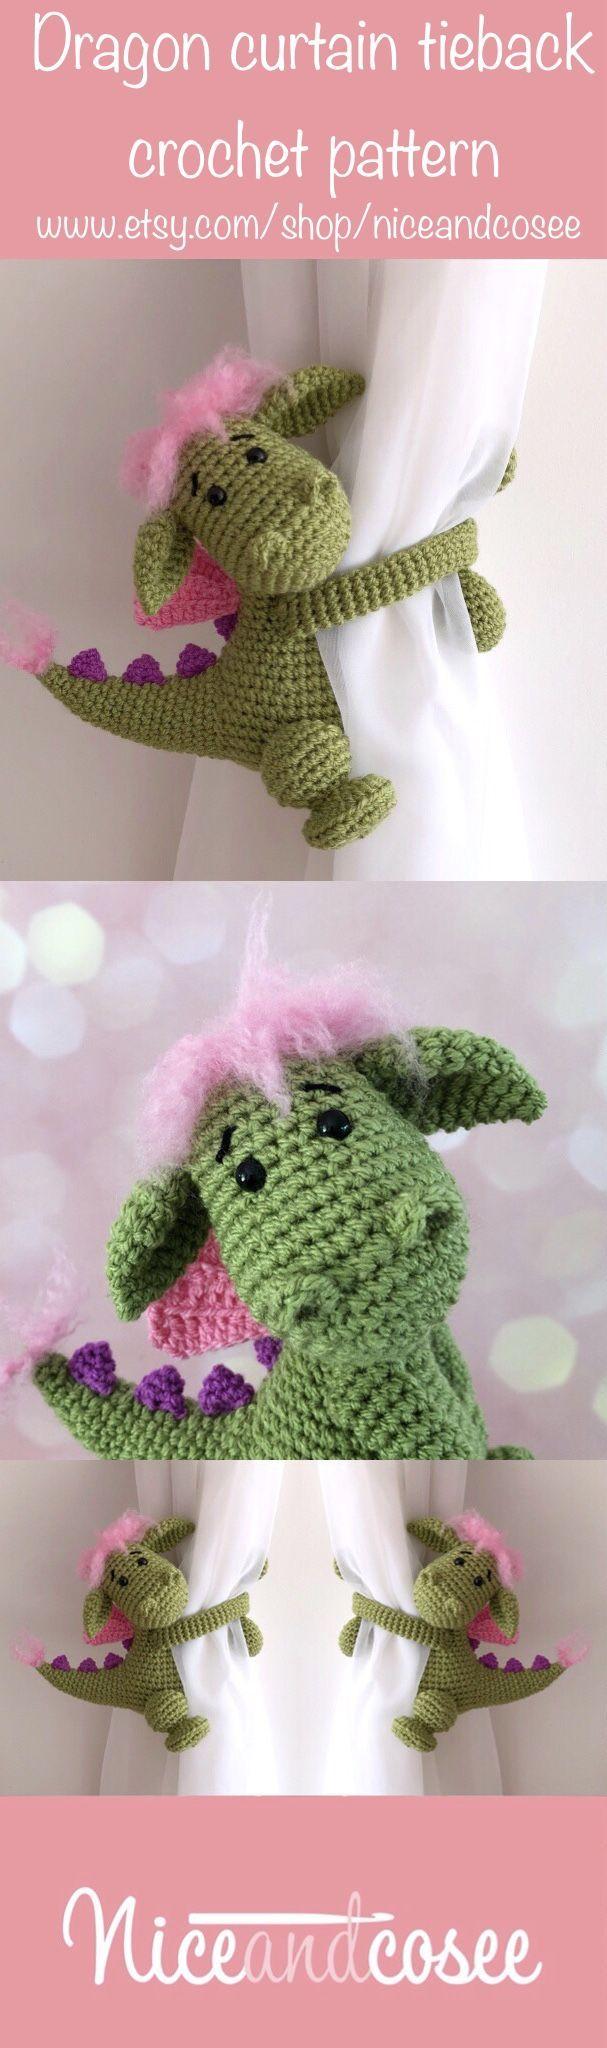 Dragon curtain tie back crochet PATTERN, tieback, left or right side crochet pattern PDF instant download amigurumi PATTERN – Love Amigurumi